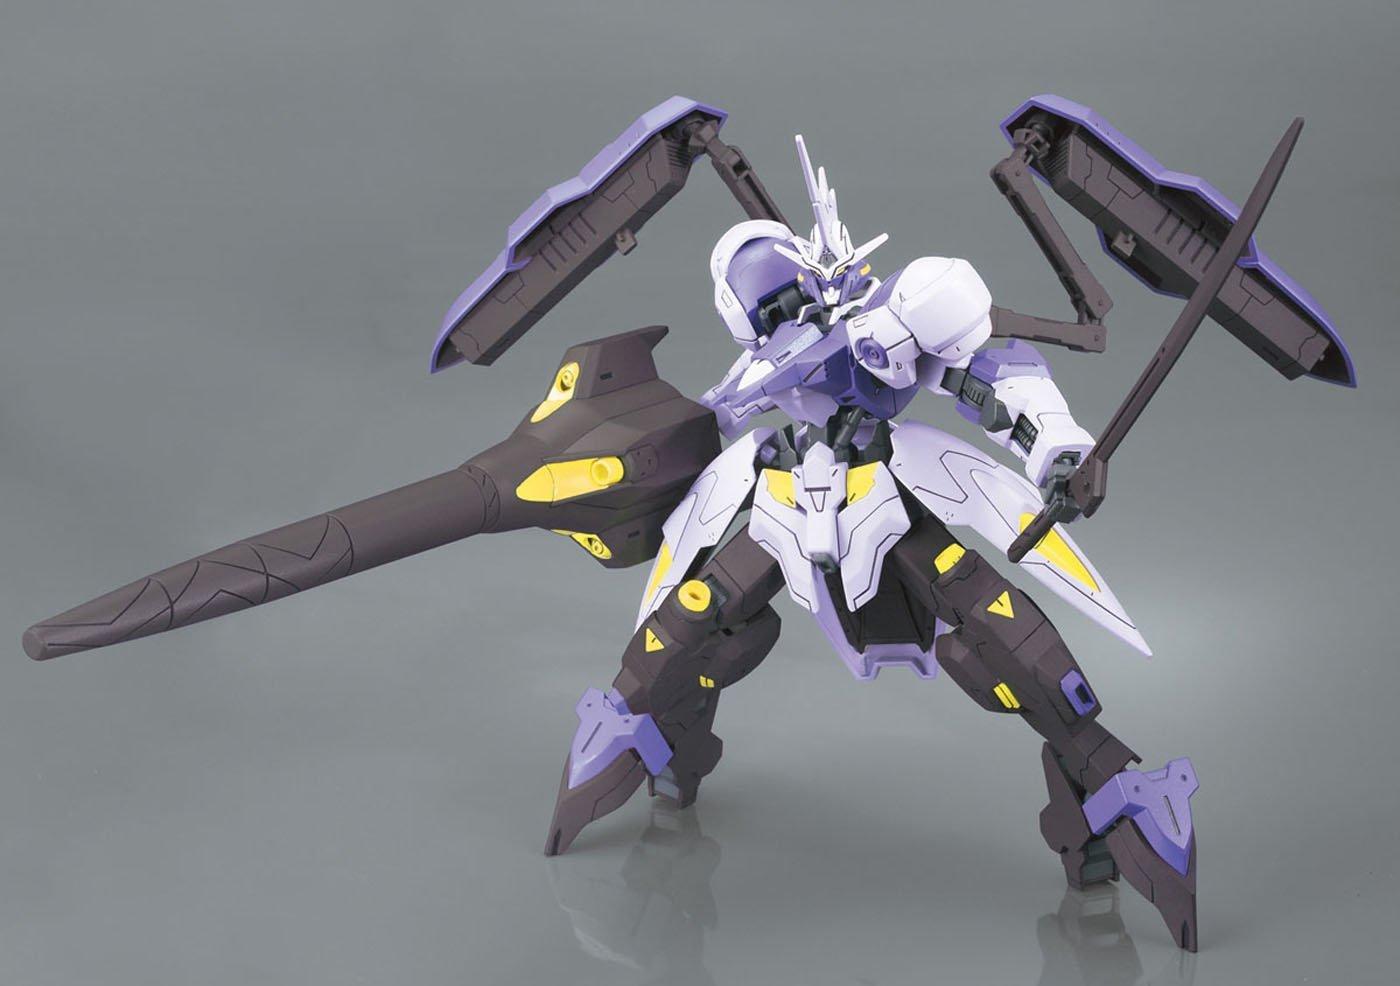 Bandai-Gundam-Iron-Blooded-Orphans-035-02